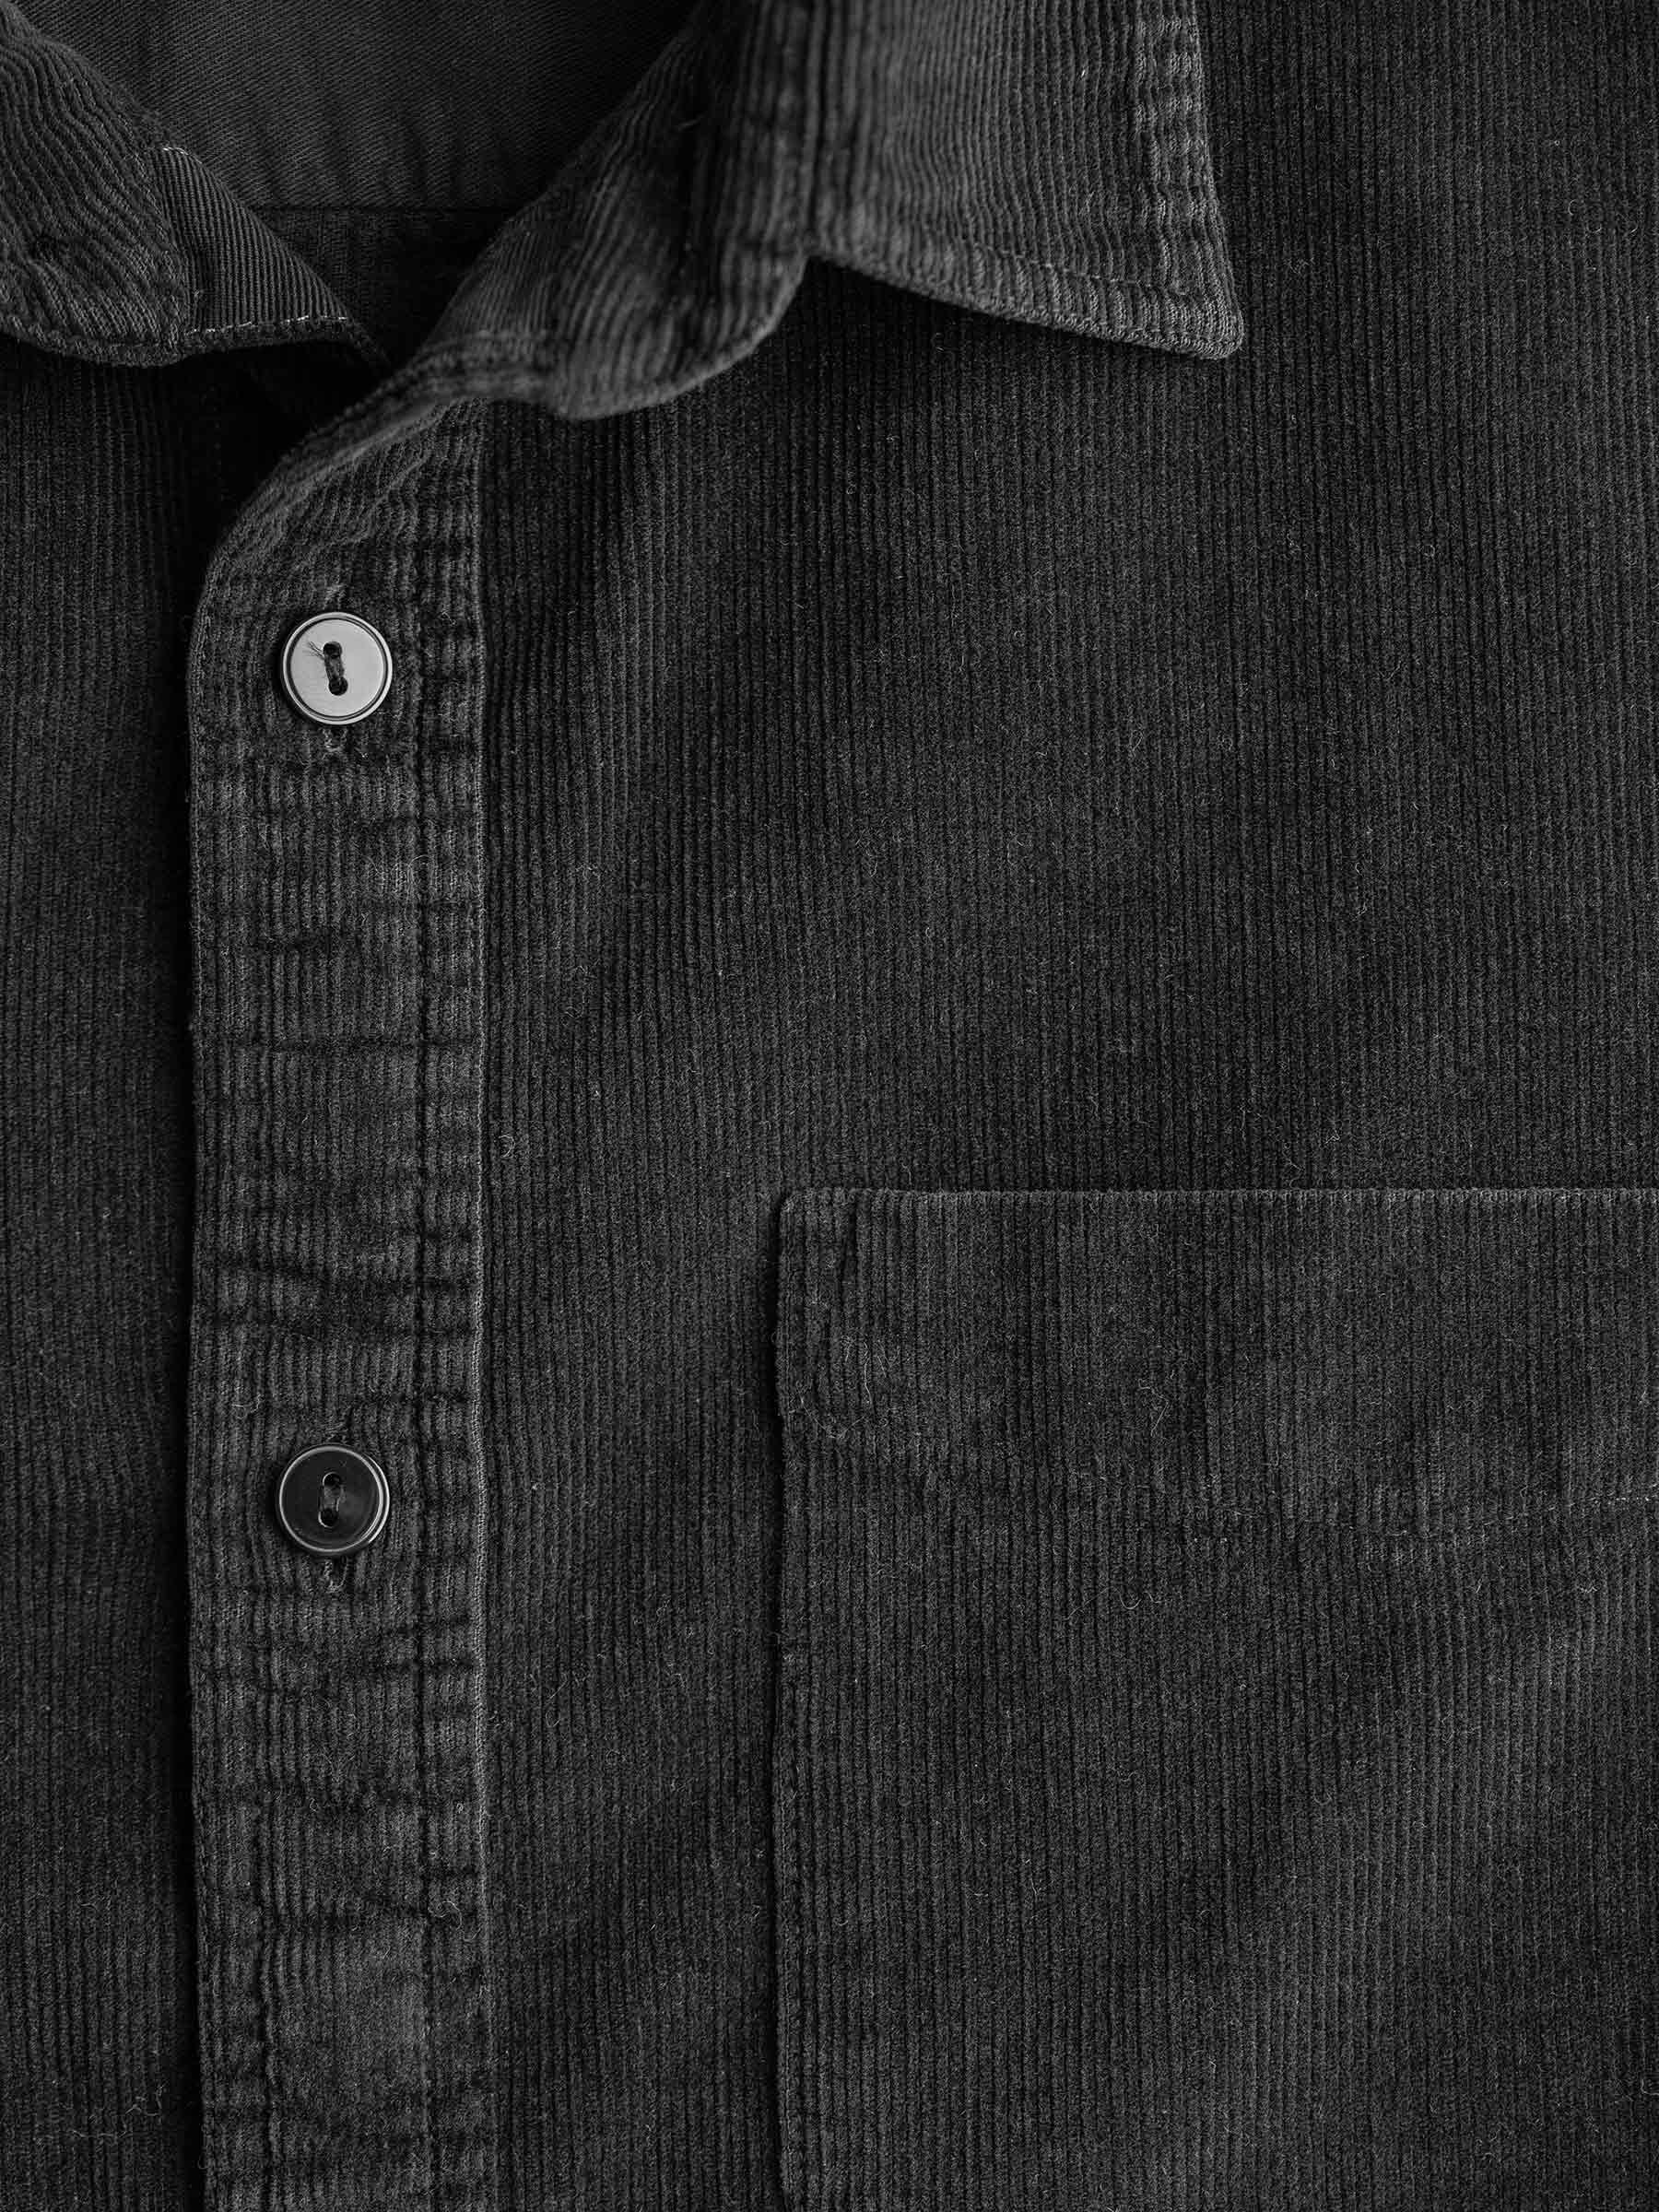 Buck Mason - Black Pincord One Pocket Work Shirt